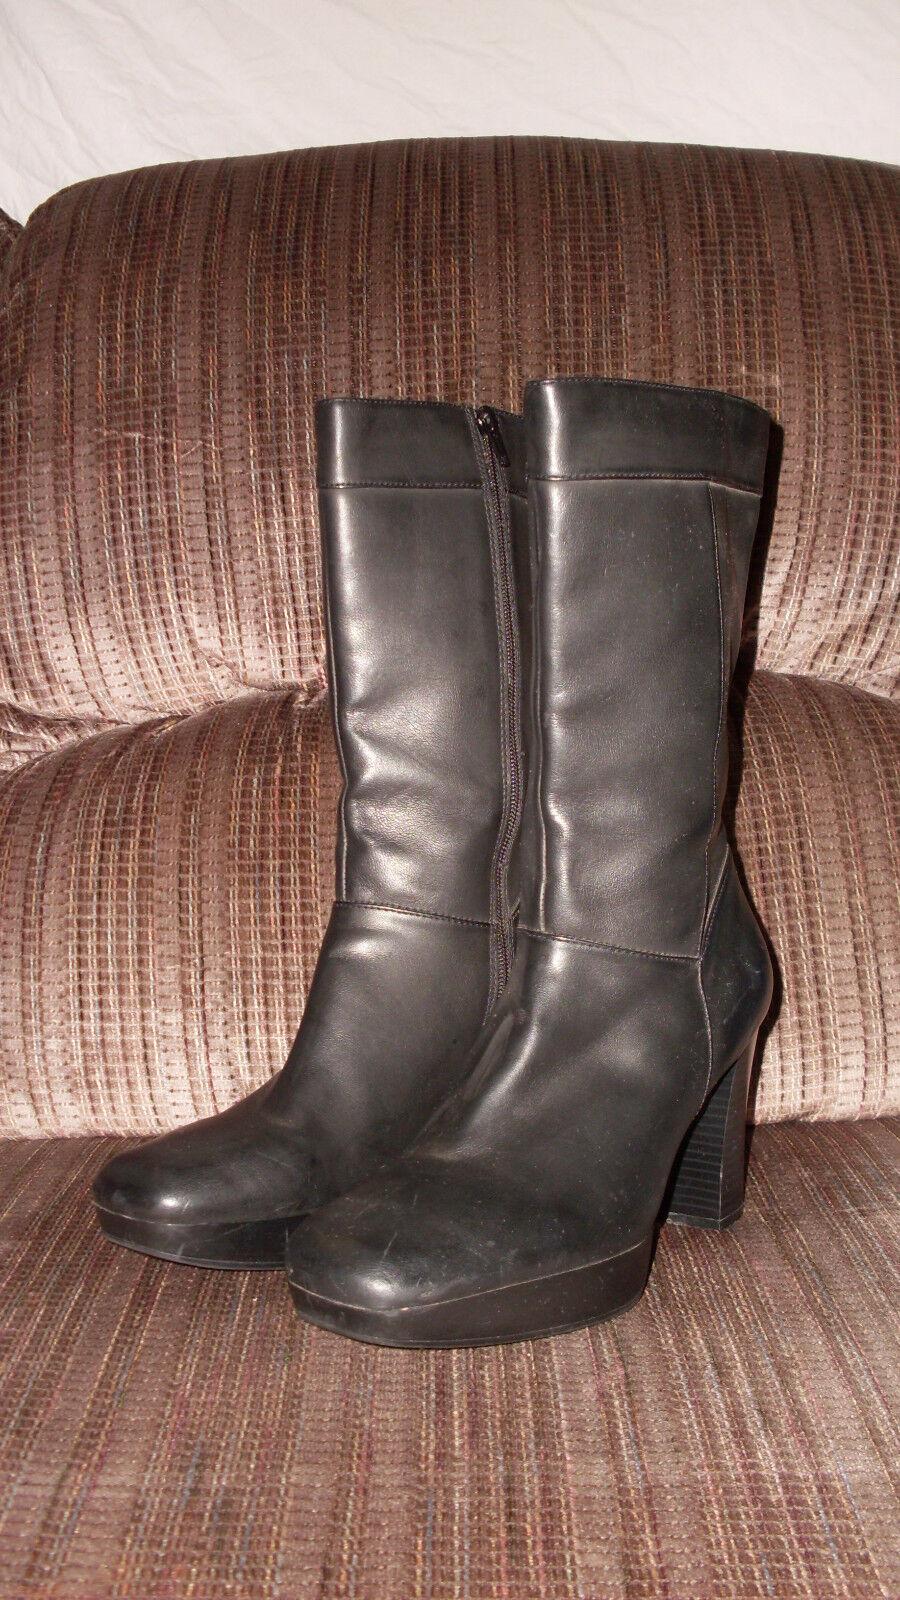 Apostrophe Black Mid Calf Boots Zipppered  Womens  JENNA sz 9M